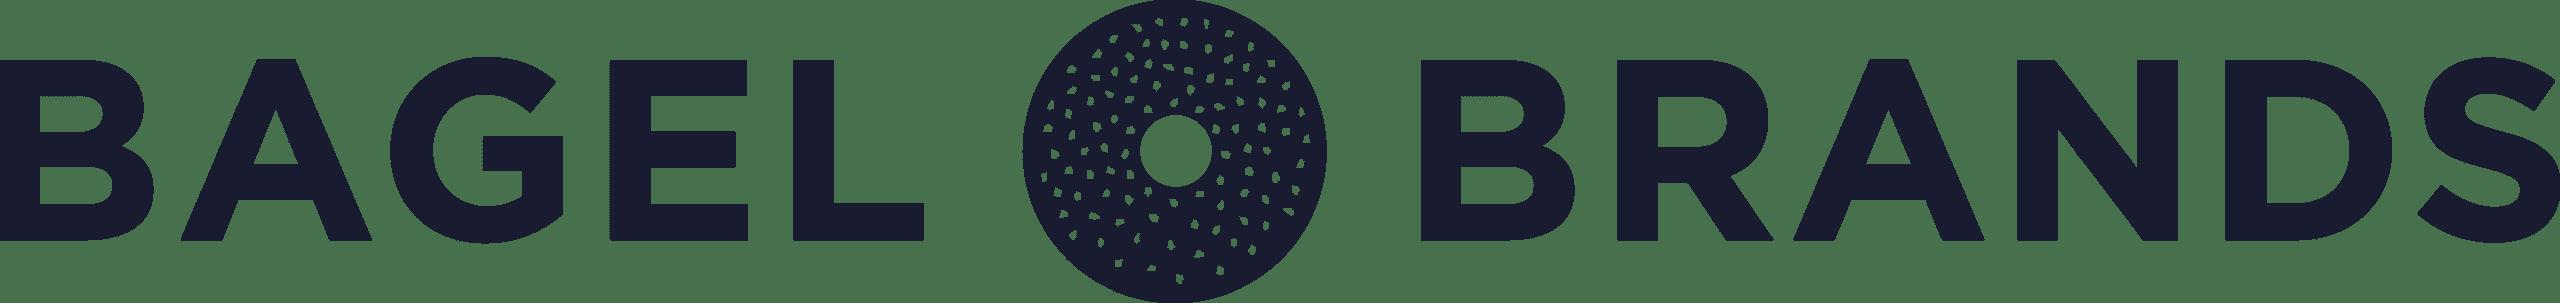 Bagel Brands logo